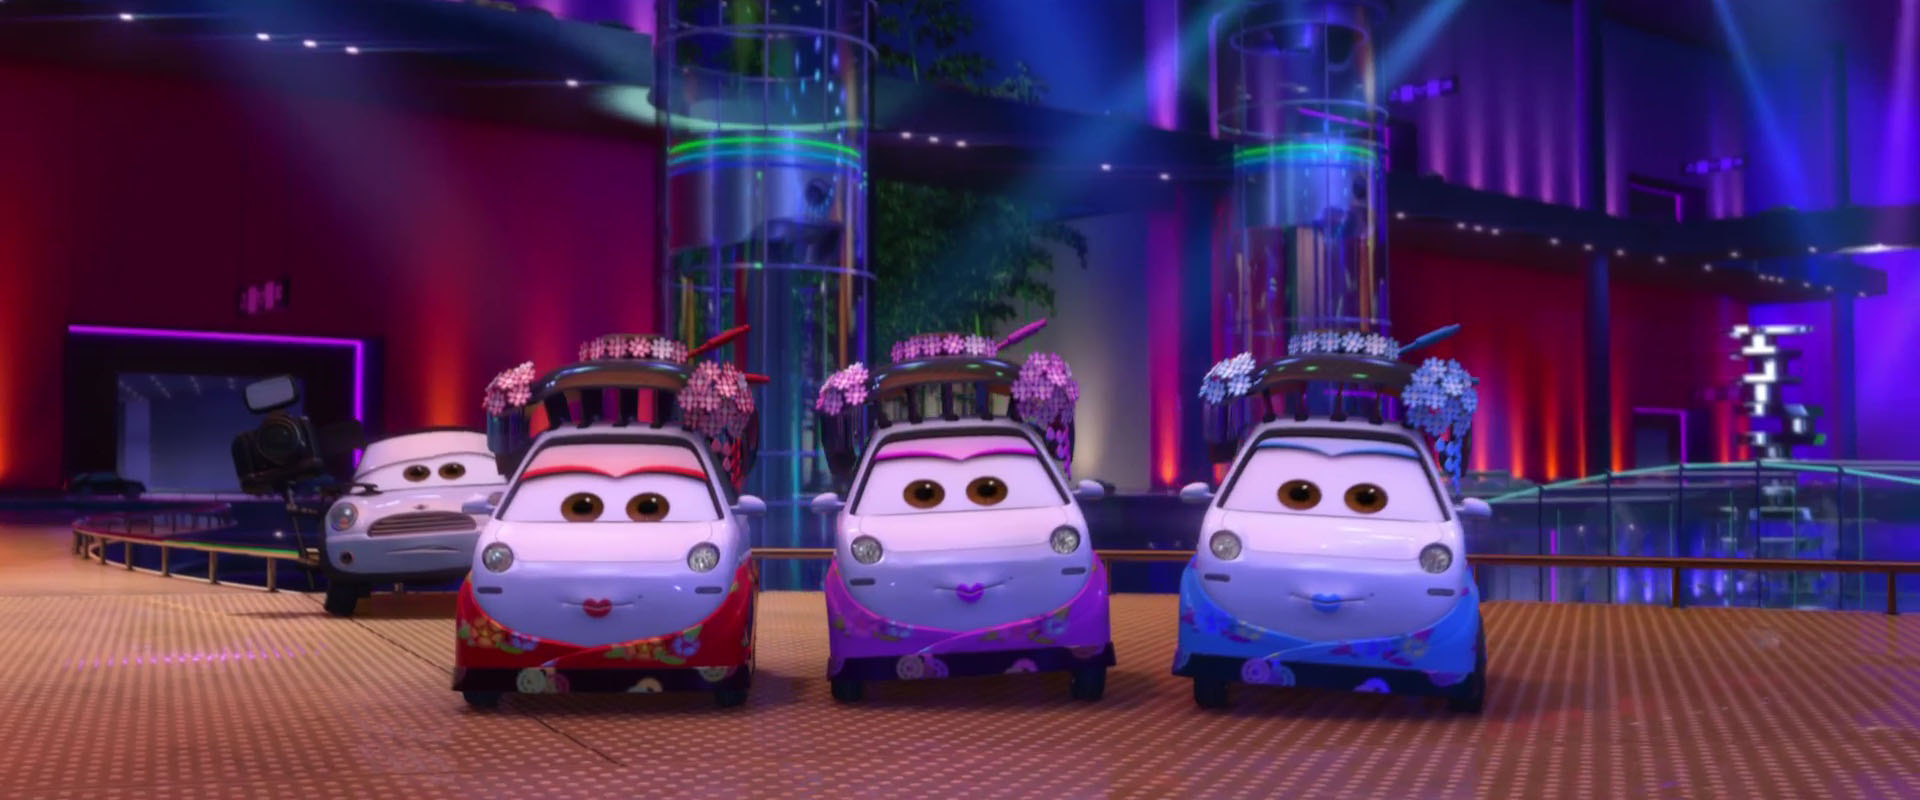 shigeko personnage character pixar disney cars 2